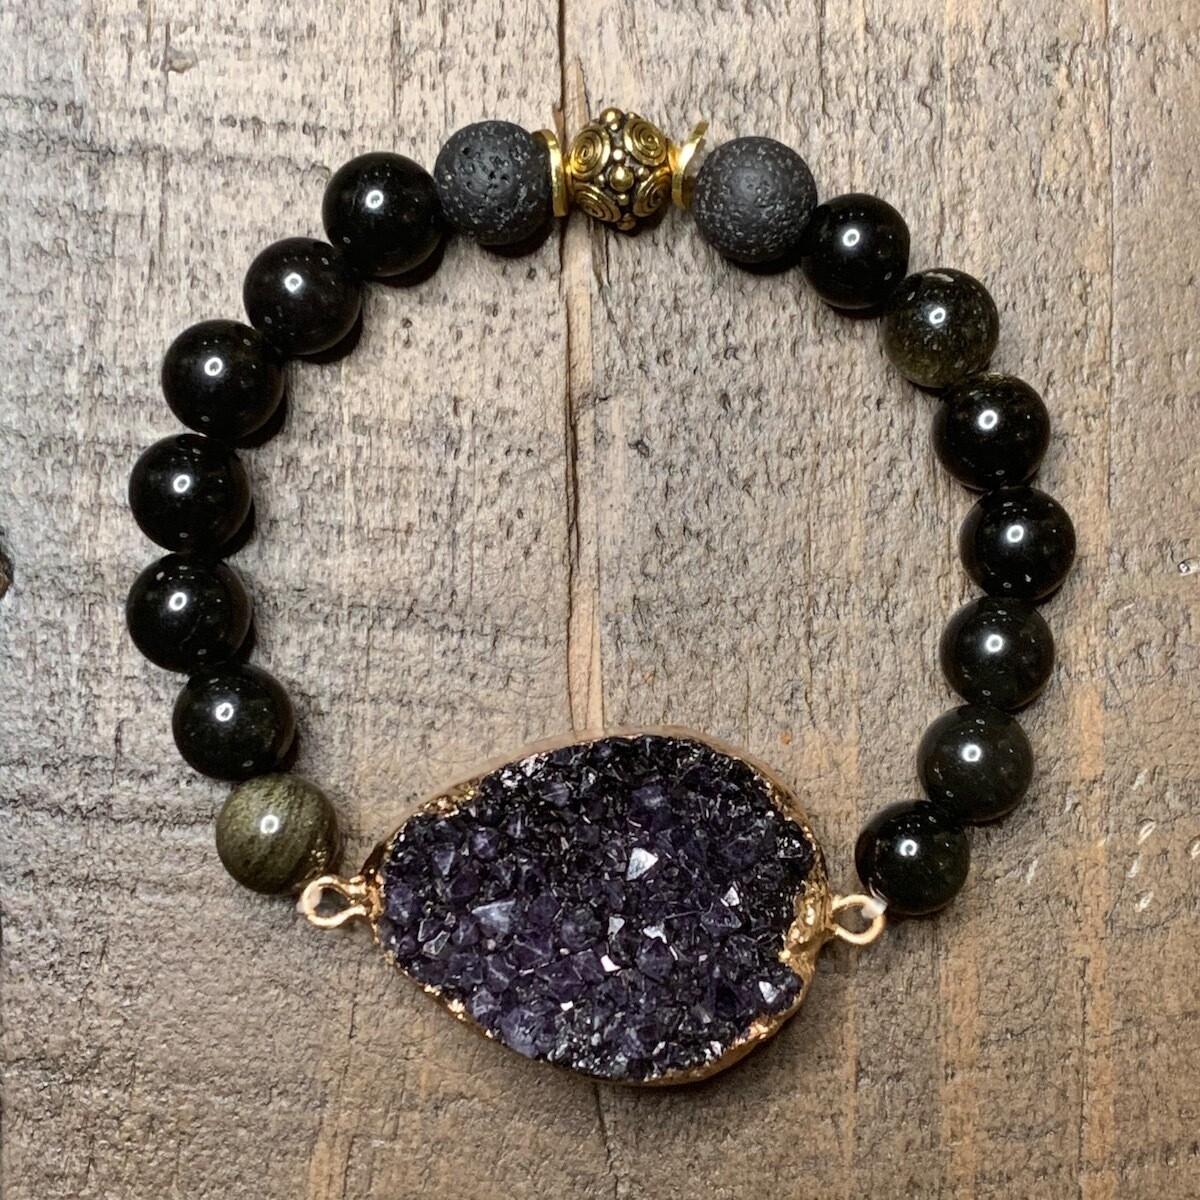 Gold & Black Obsidian Druzy Bracelet-8mm (6.5